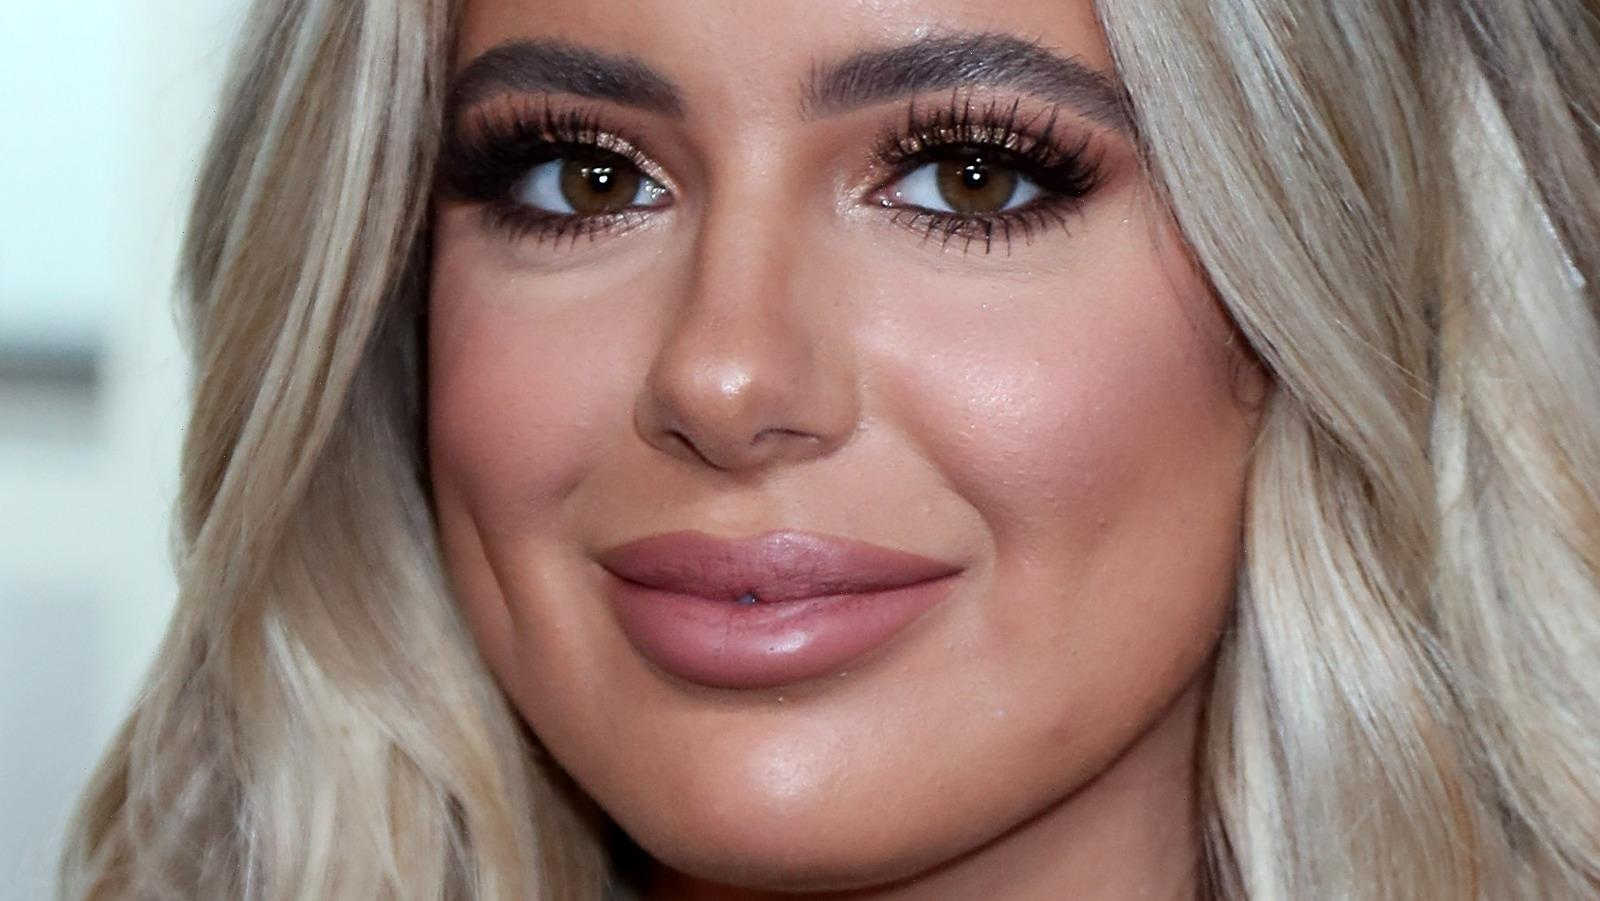 The Real Reason Brielle Biermann Got Jaw Surgery